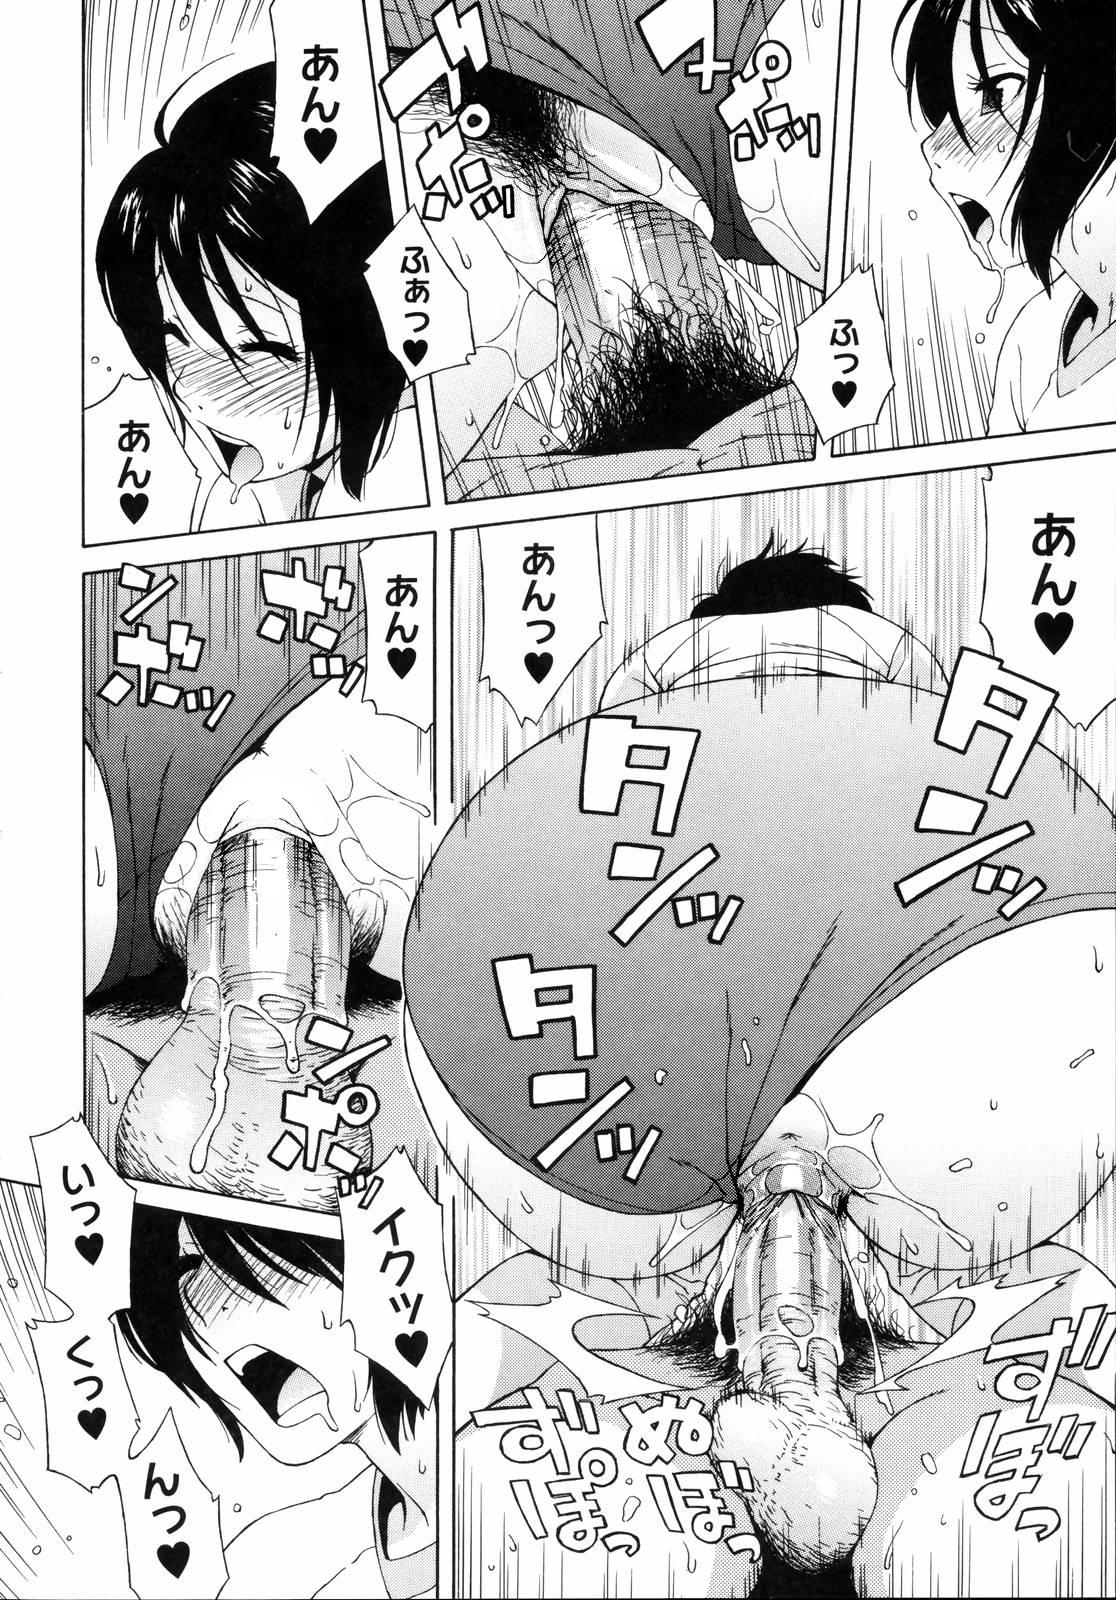 Shishunki wa Hatsujouki - Adolescence is a sexual excitement period. 23